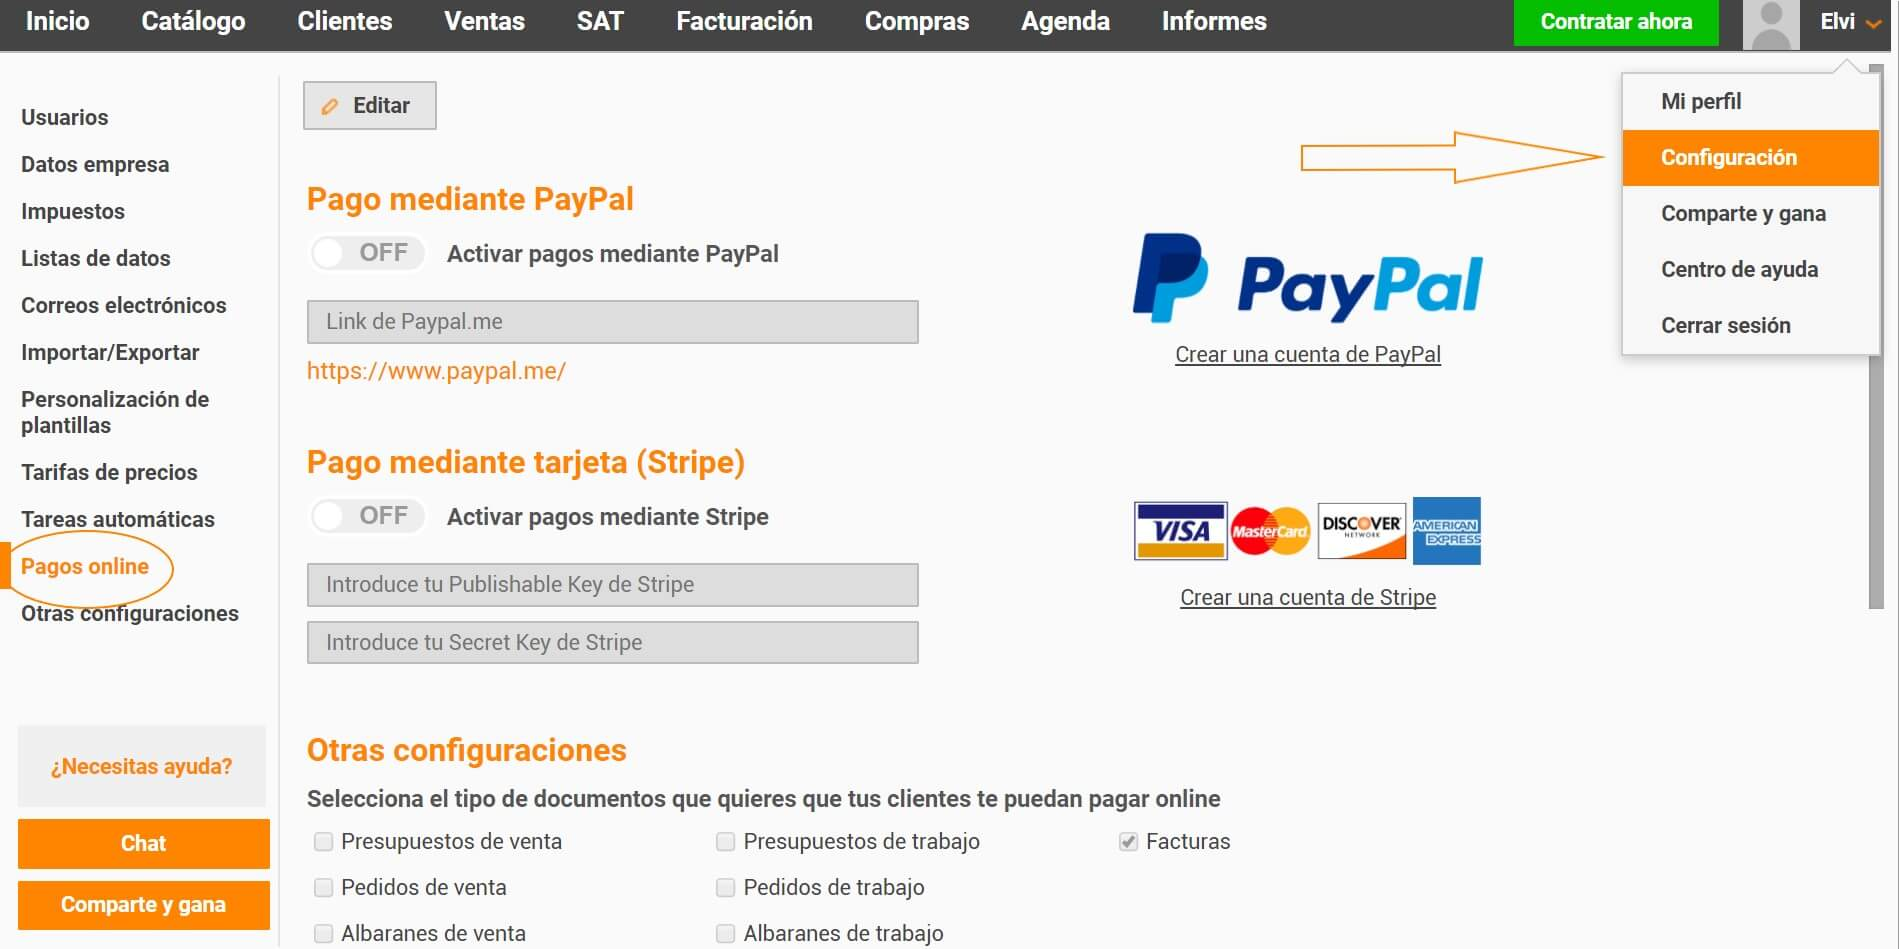 Pagos online desde ERPonline